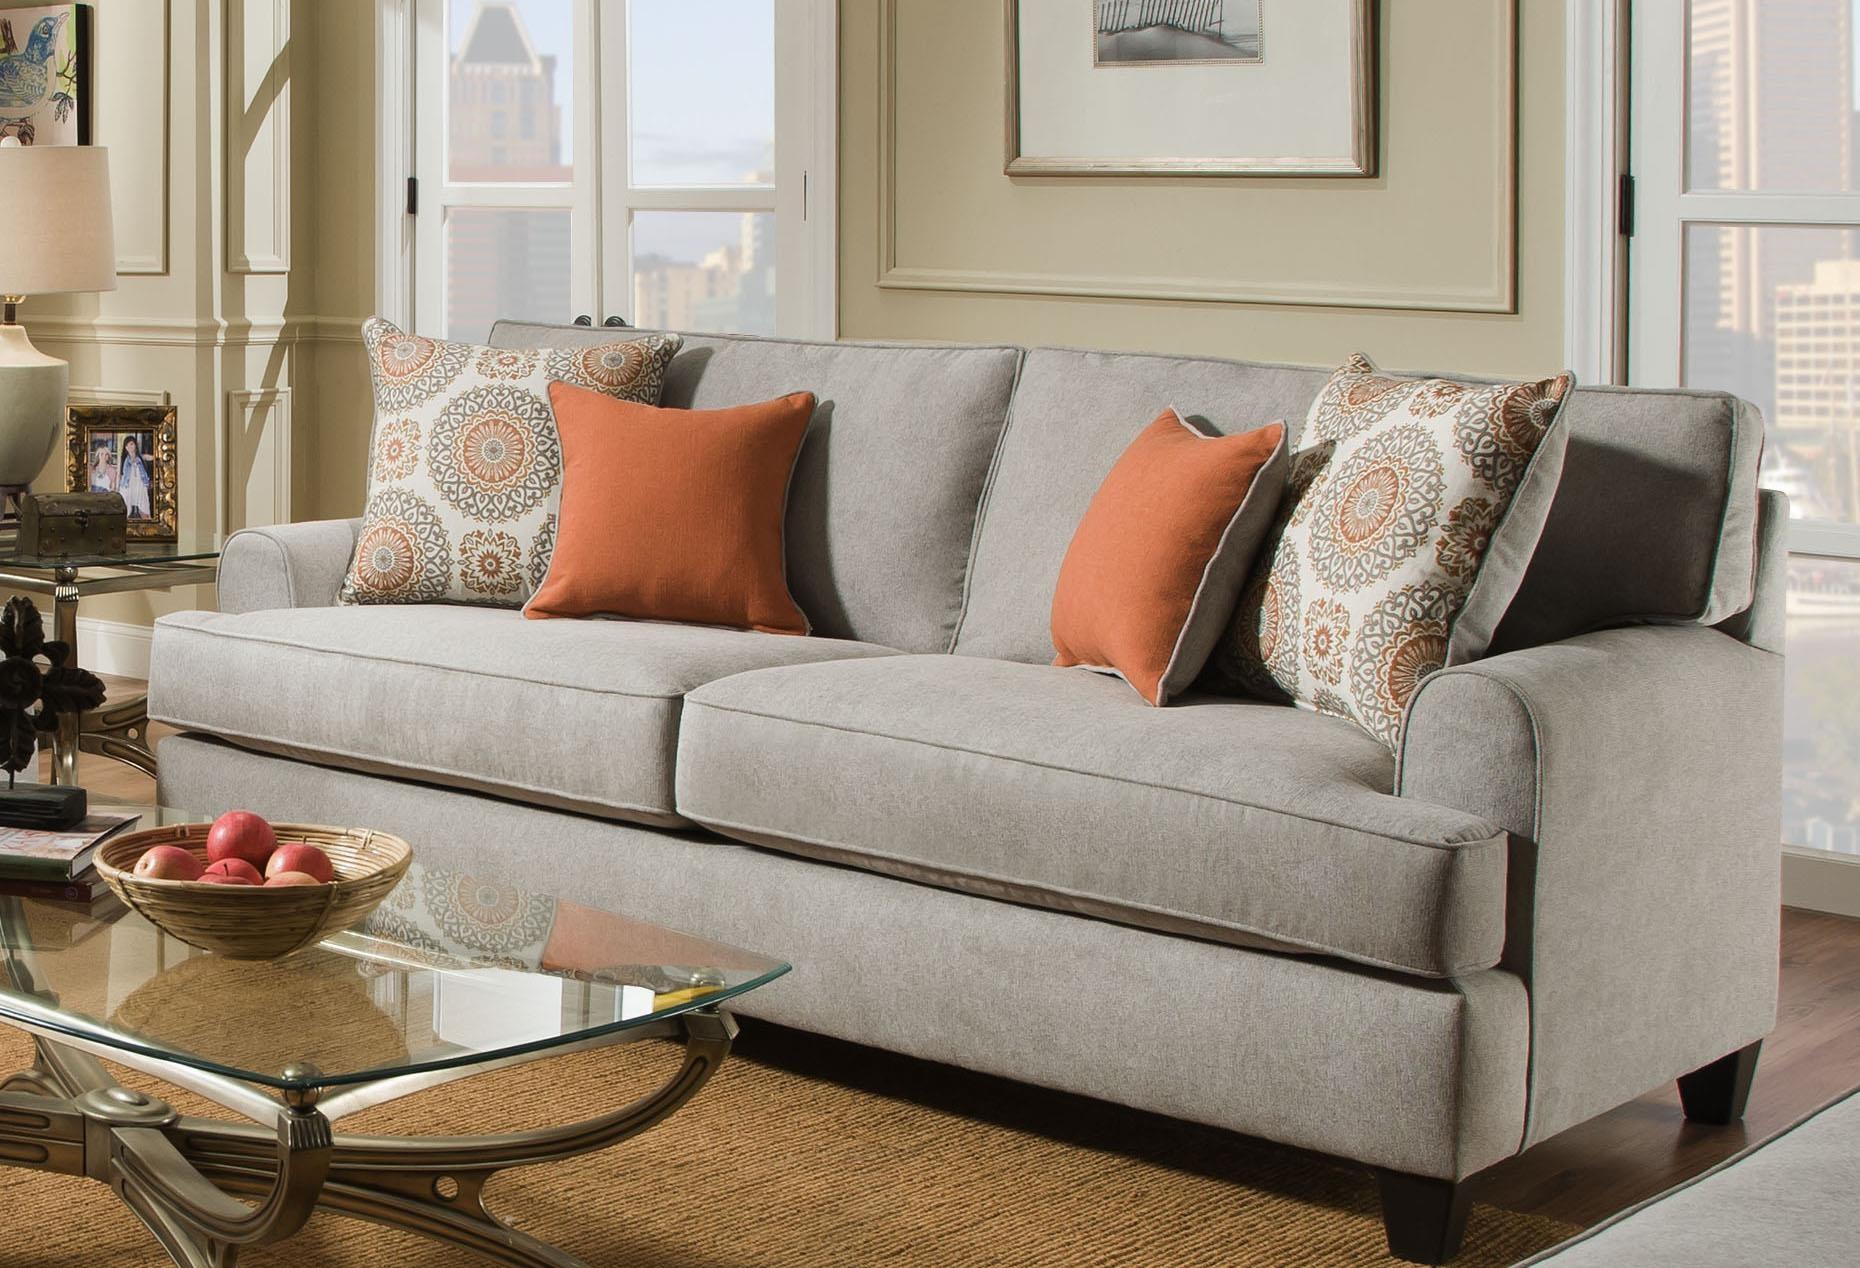 american furniture popstitch dove 1953 2021 sofa great american home store sofas. Black Bedroom Furniture Sets. Home Design Ideas